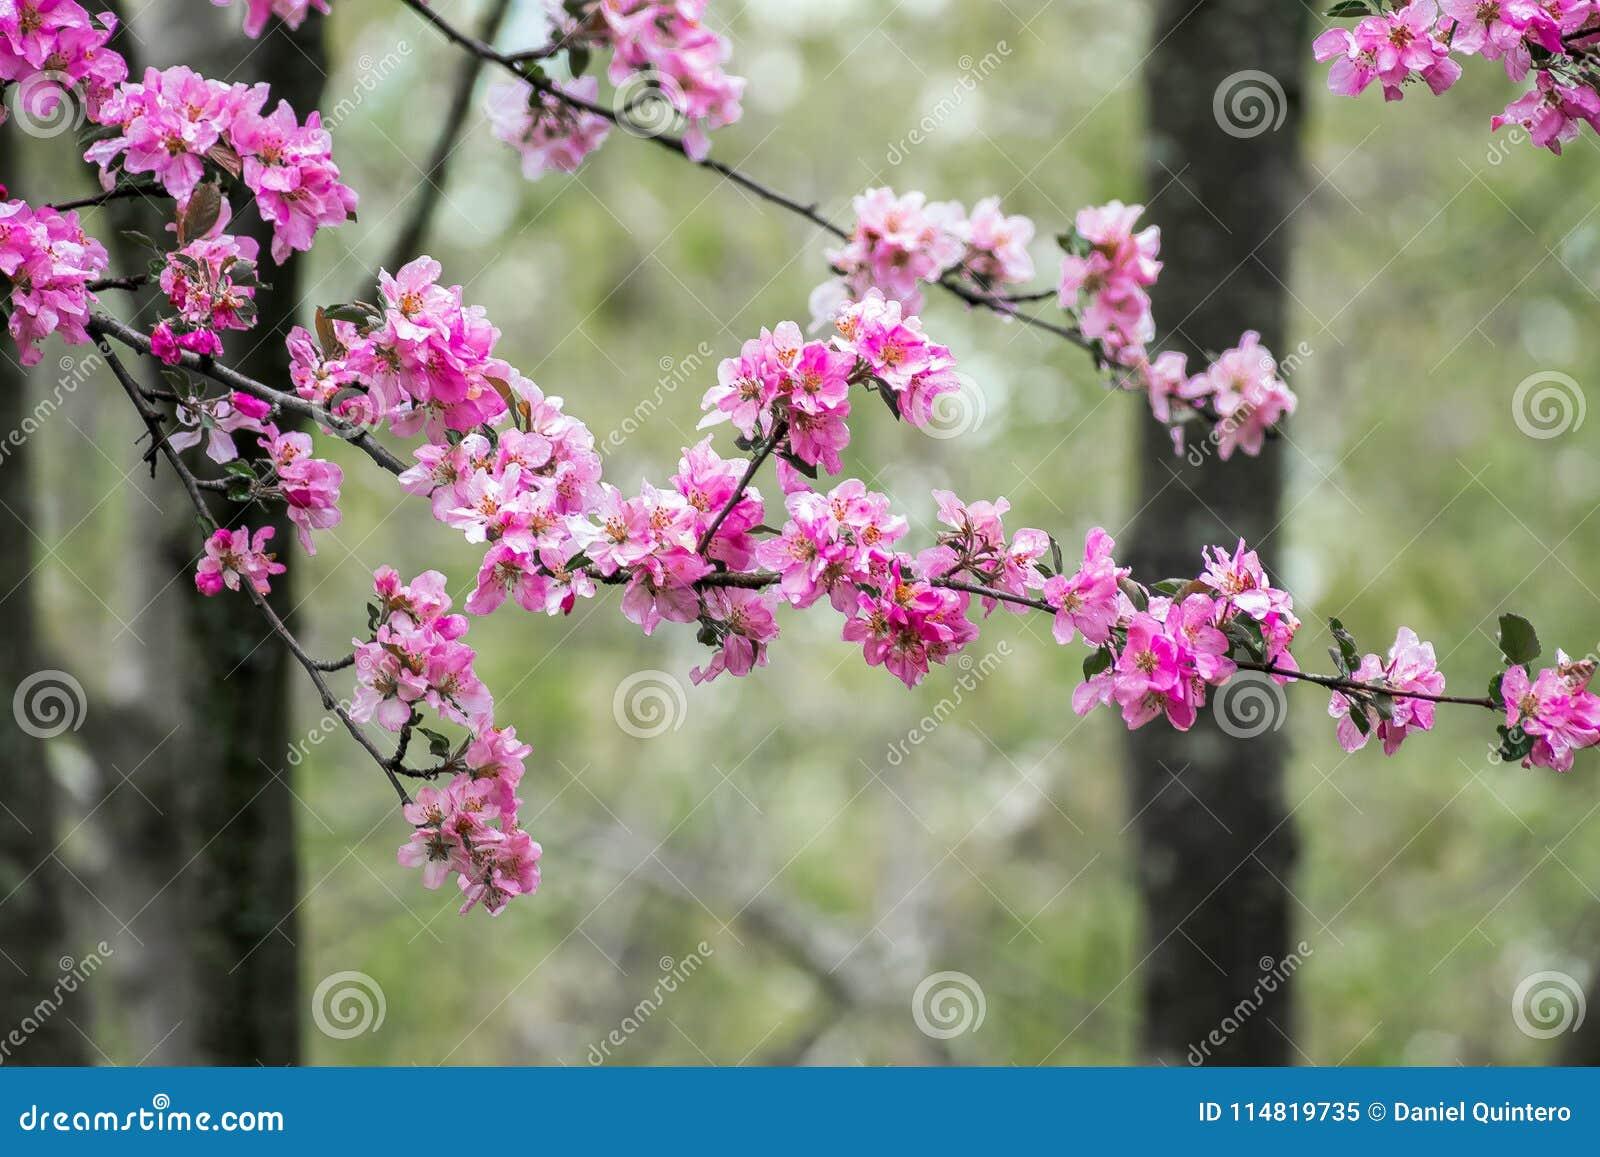 Pink blossom flowers and trees stock image image of coast cargo royalty free stock photo mightylinksfo